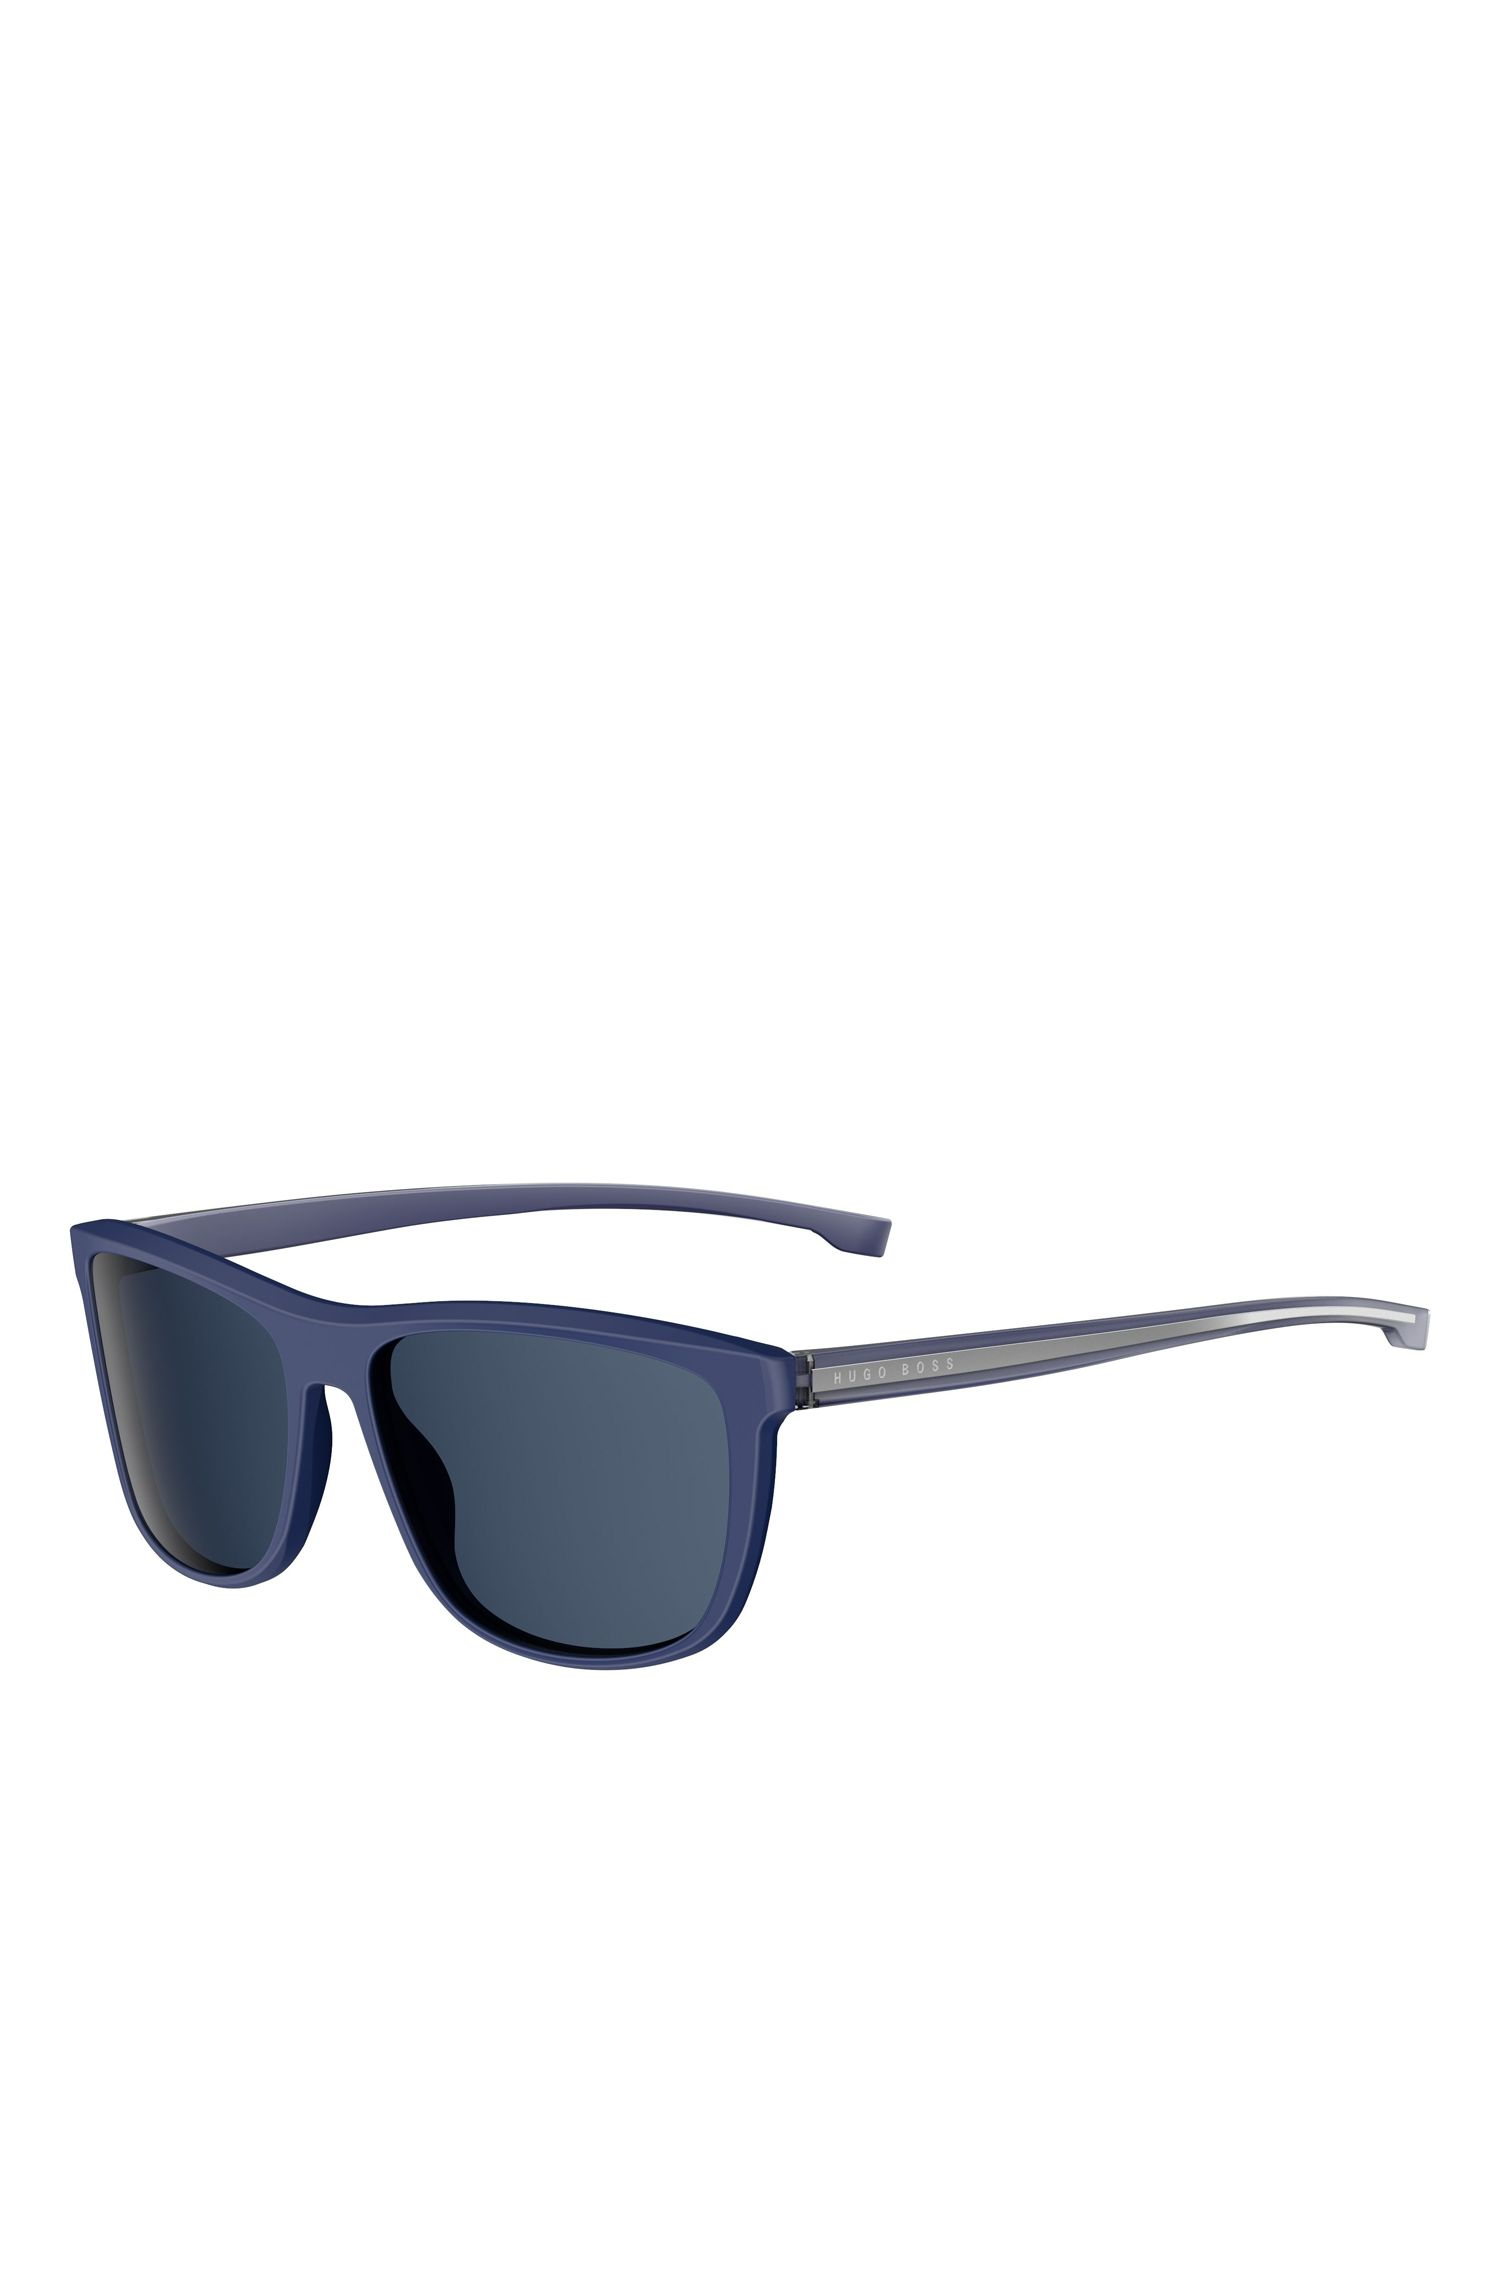 'BOSS 0874S' | Blue Lens Top Bar Sunglasses